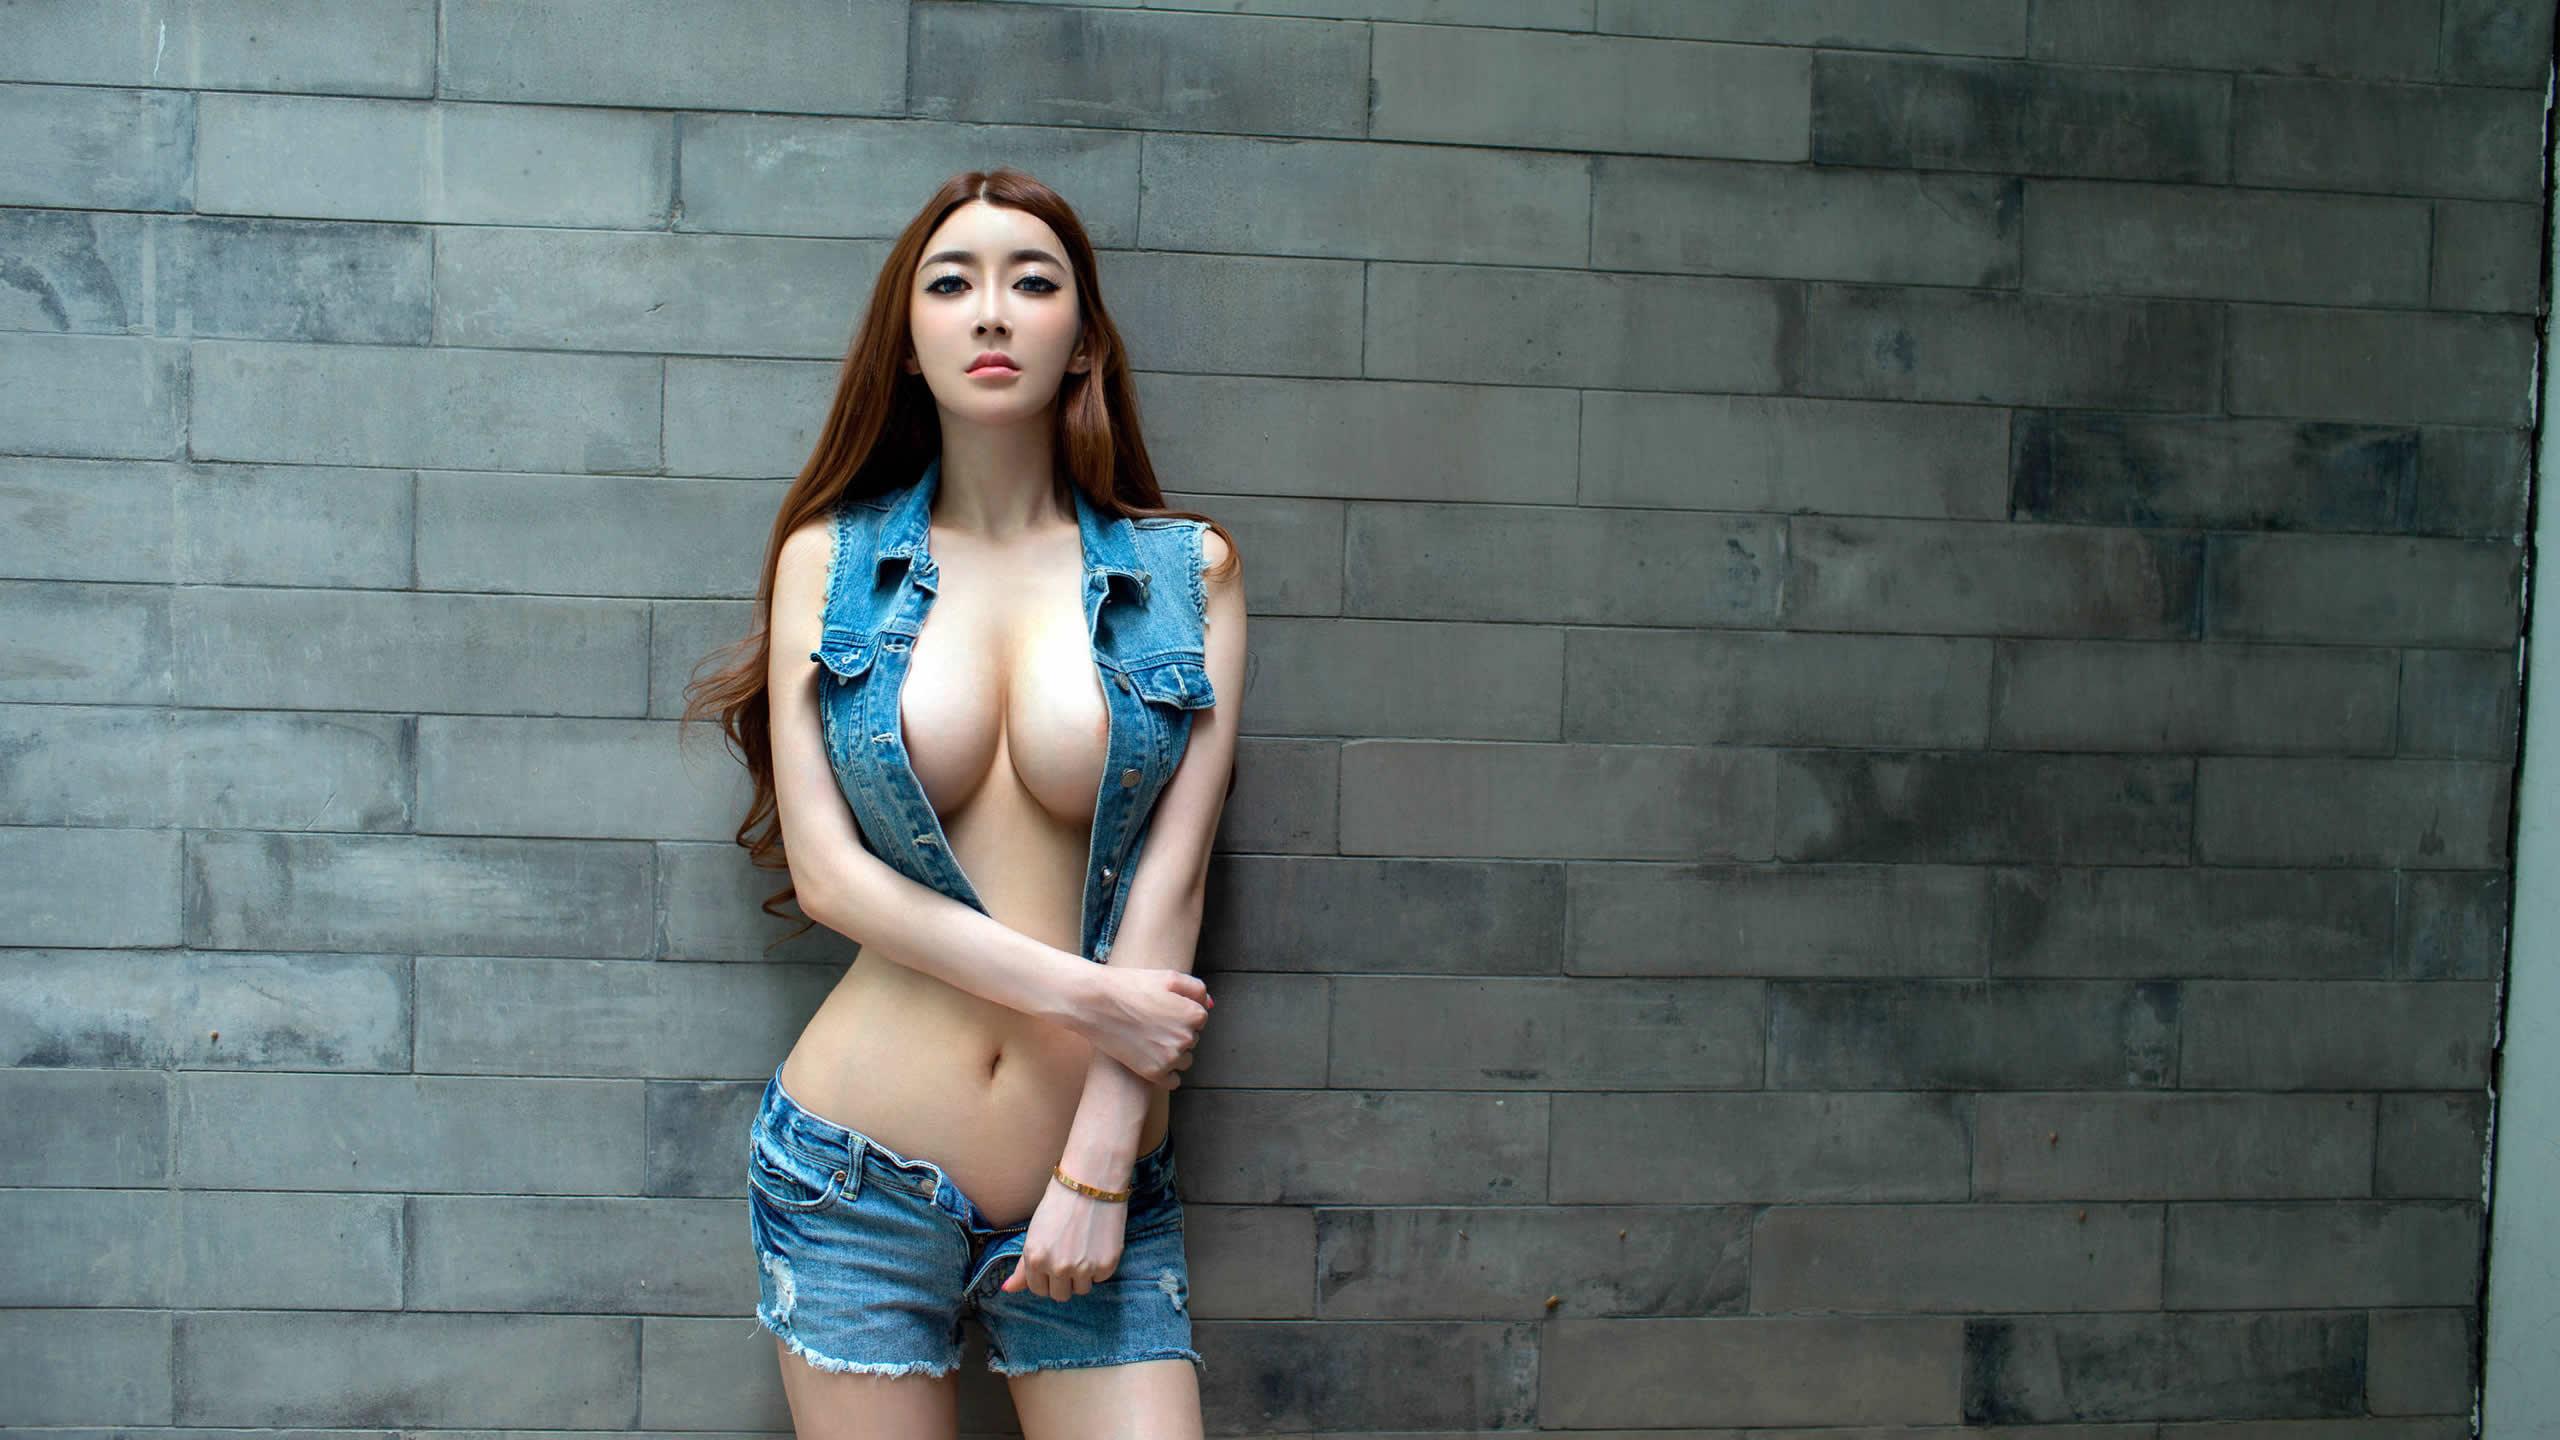 lehigh-valley-asian-girl-seeking-older-guys-screwing-young-girls